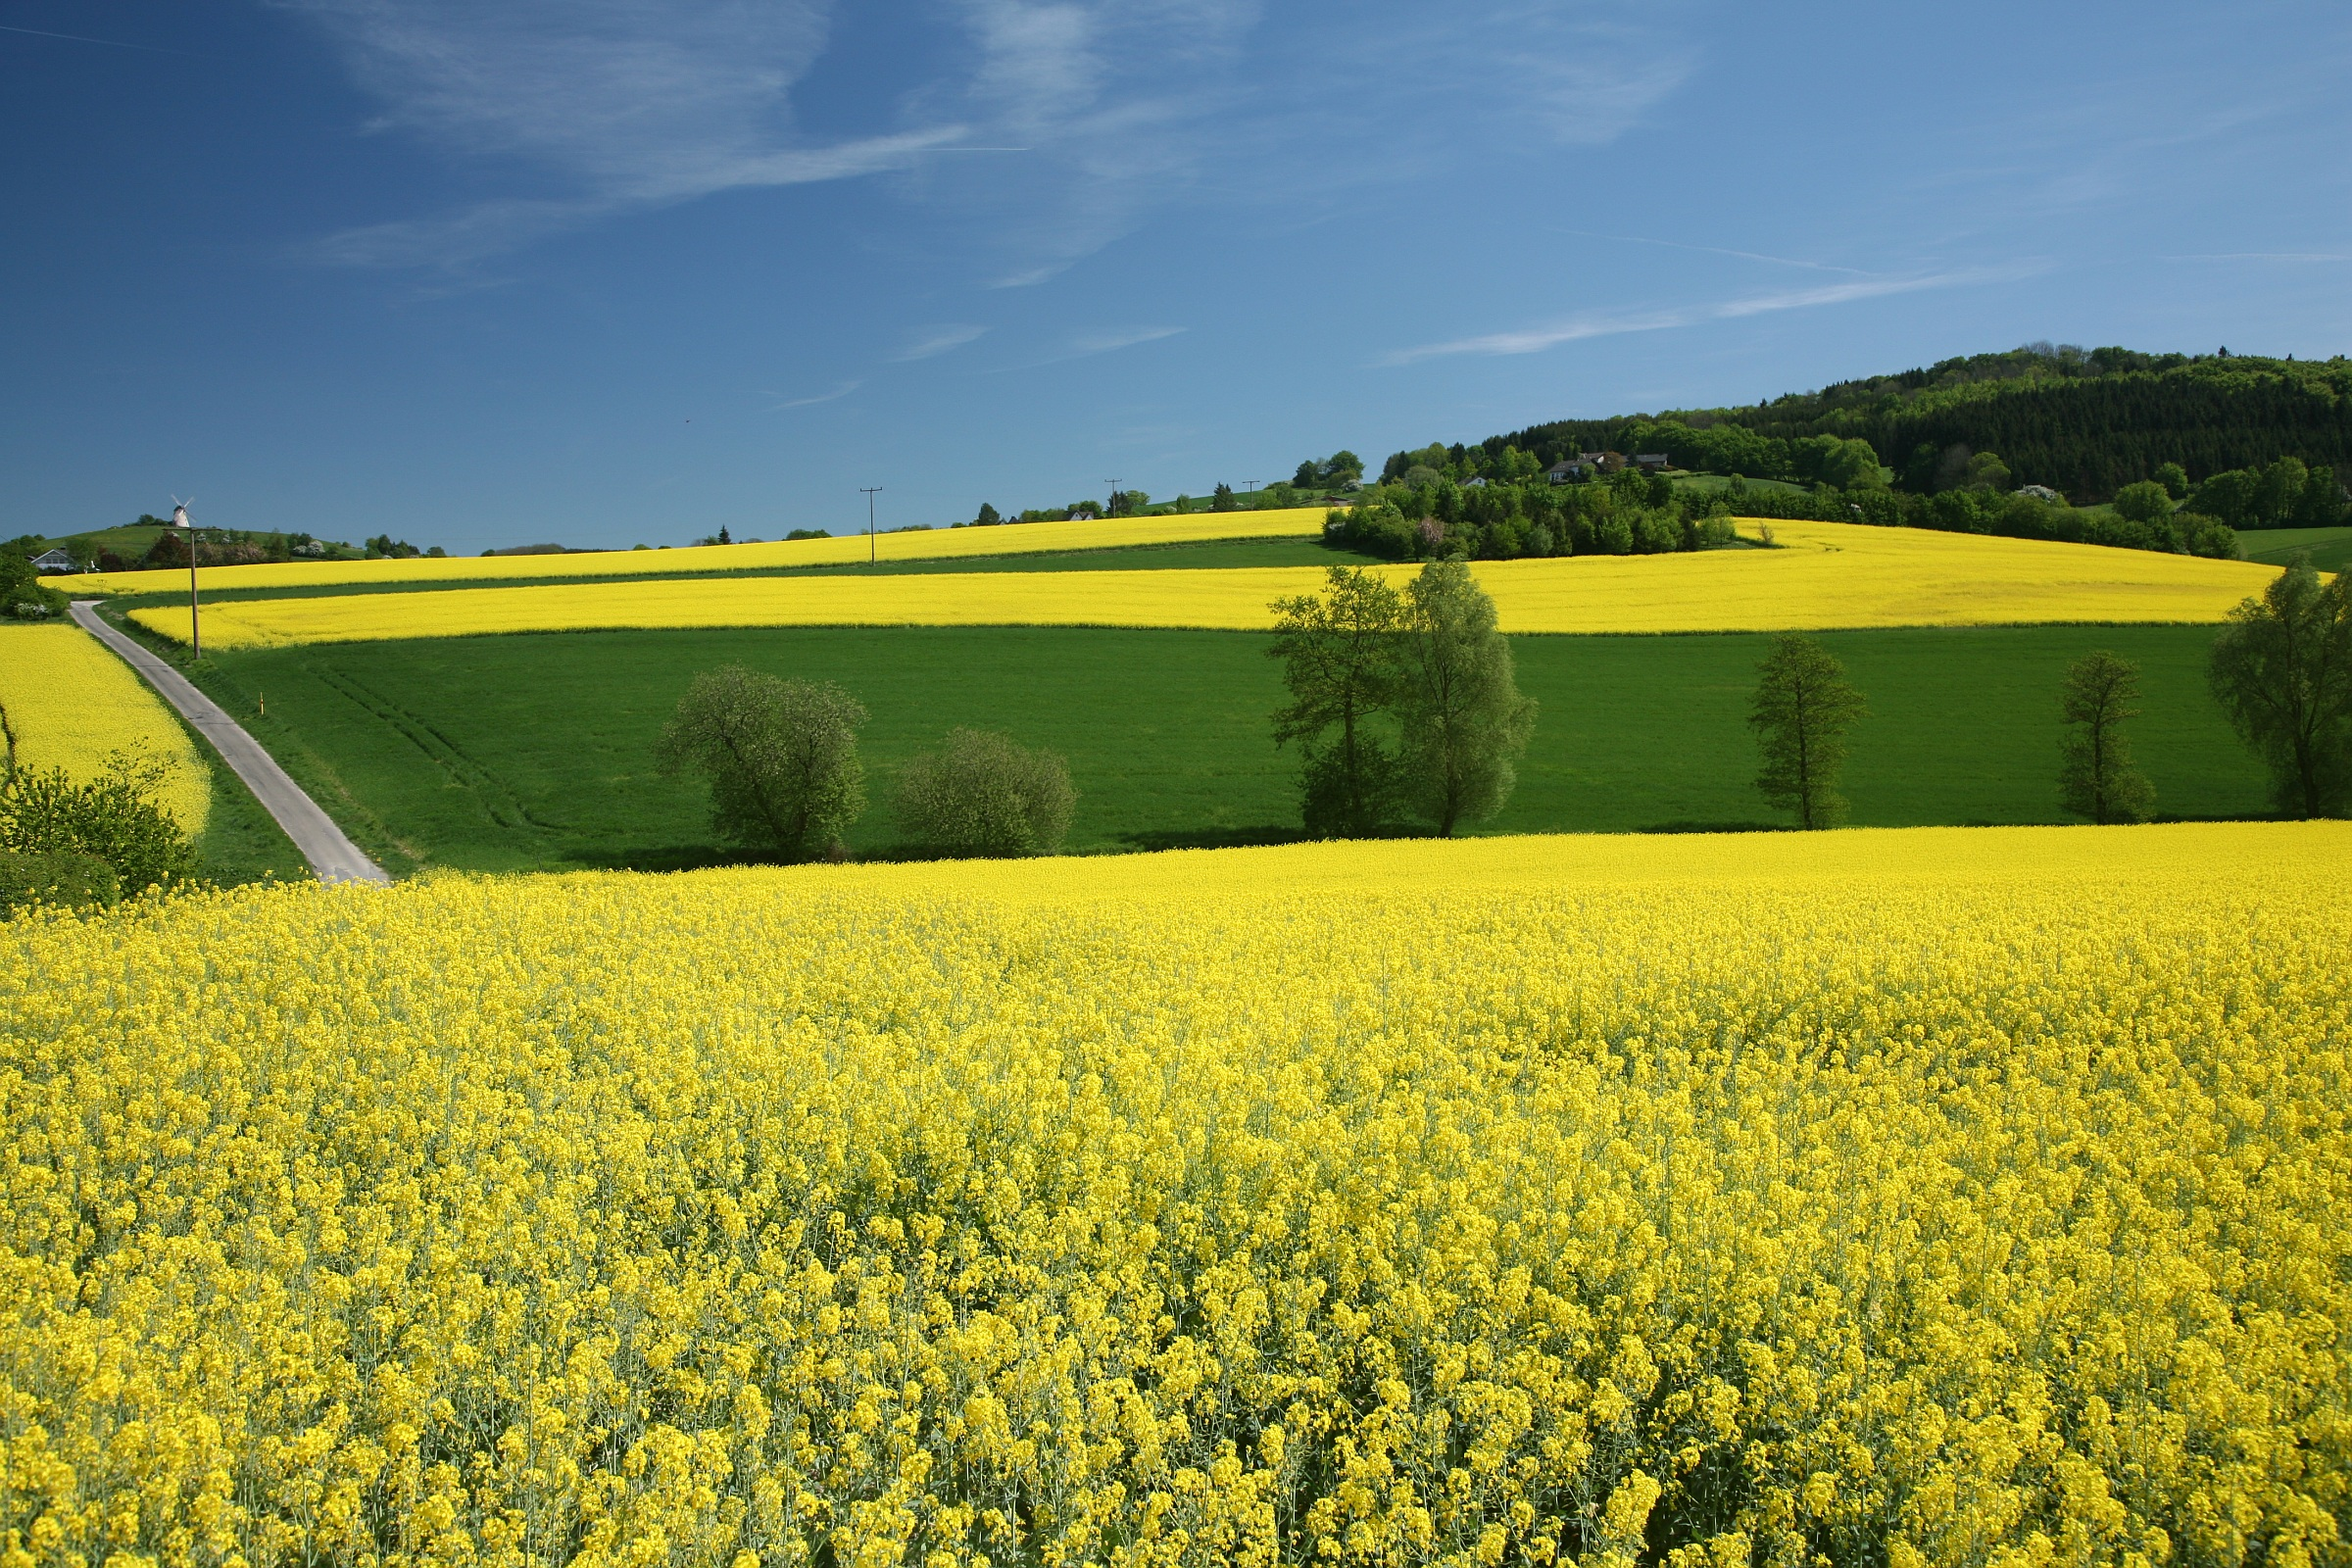 Quelles plantes peut-on transformer en biocarburants ?